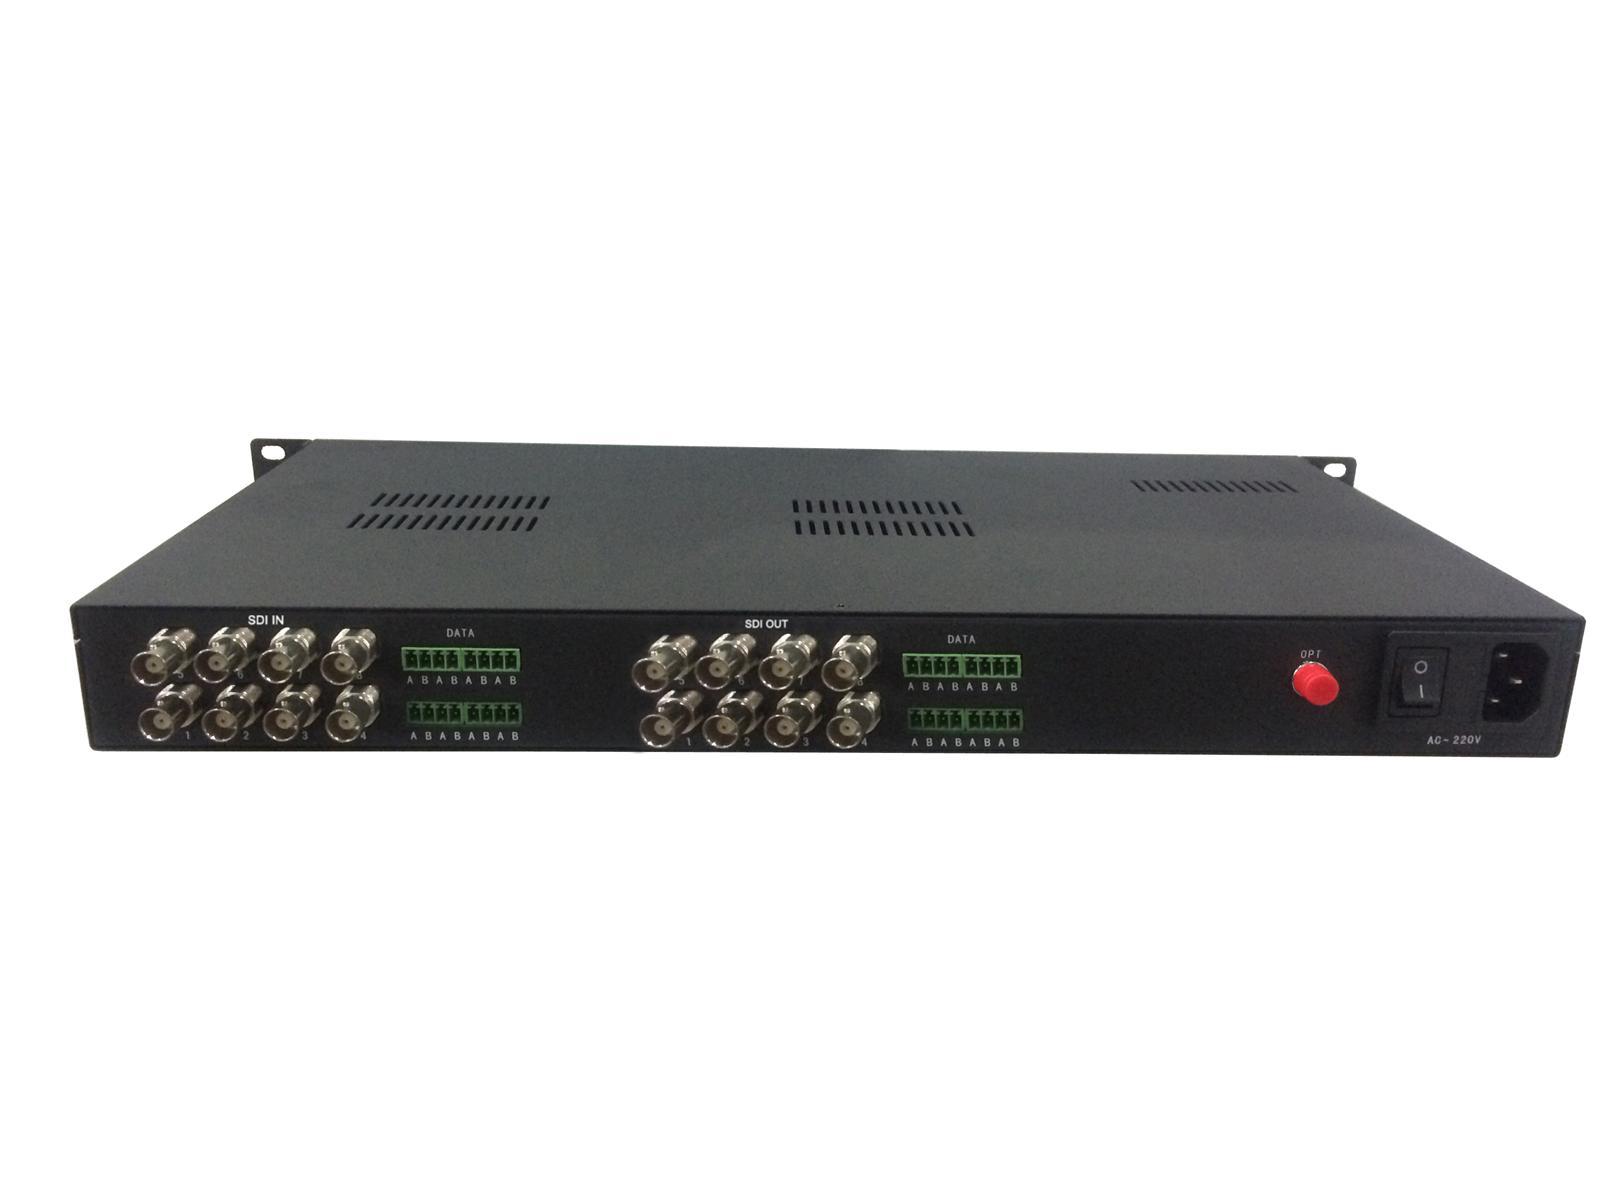 16-ch SDI ASI optical transceiver